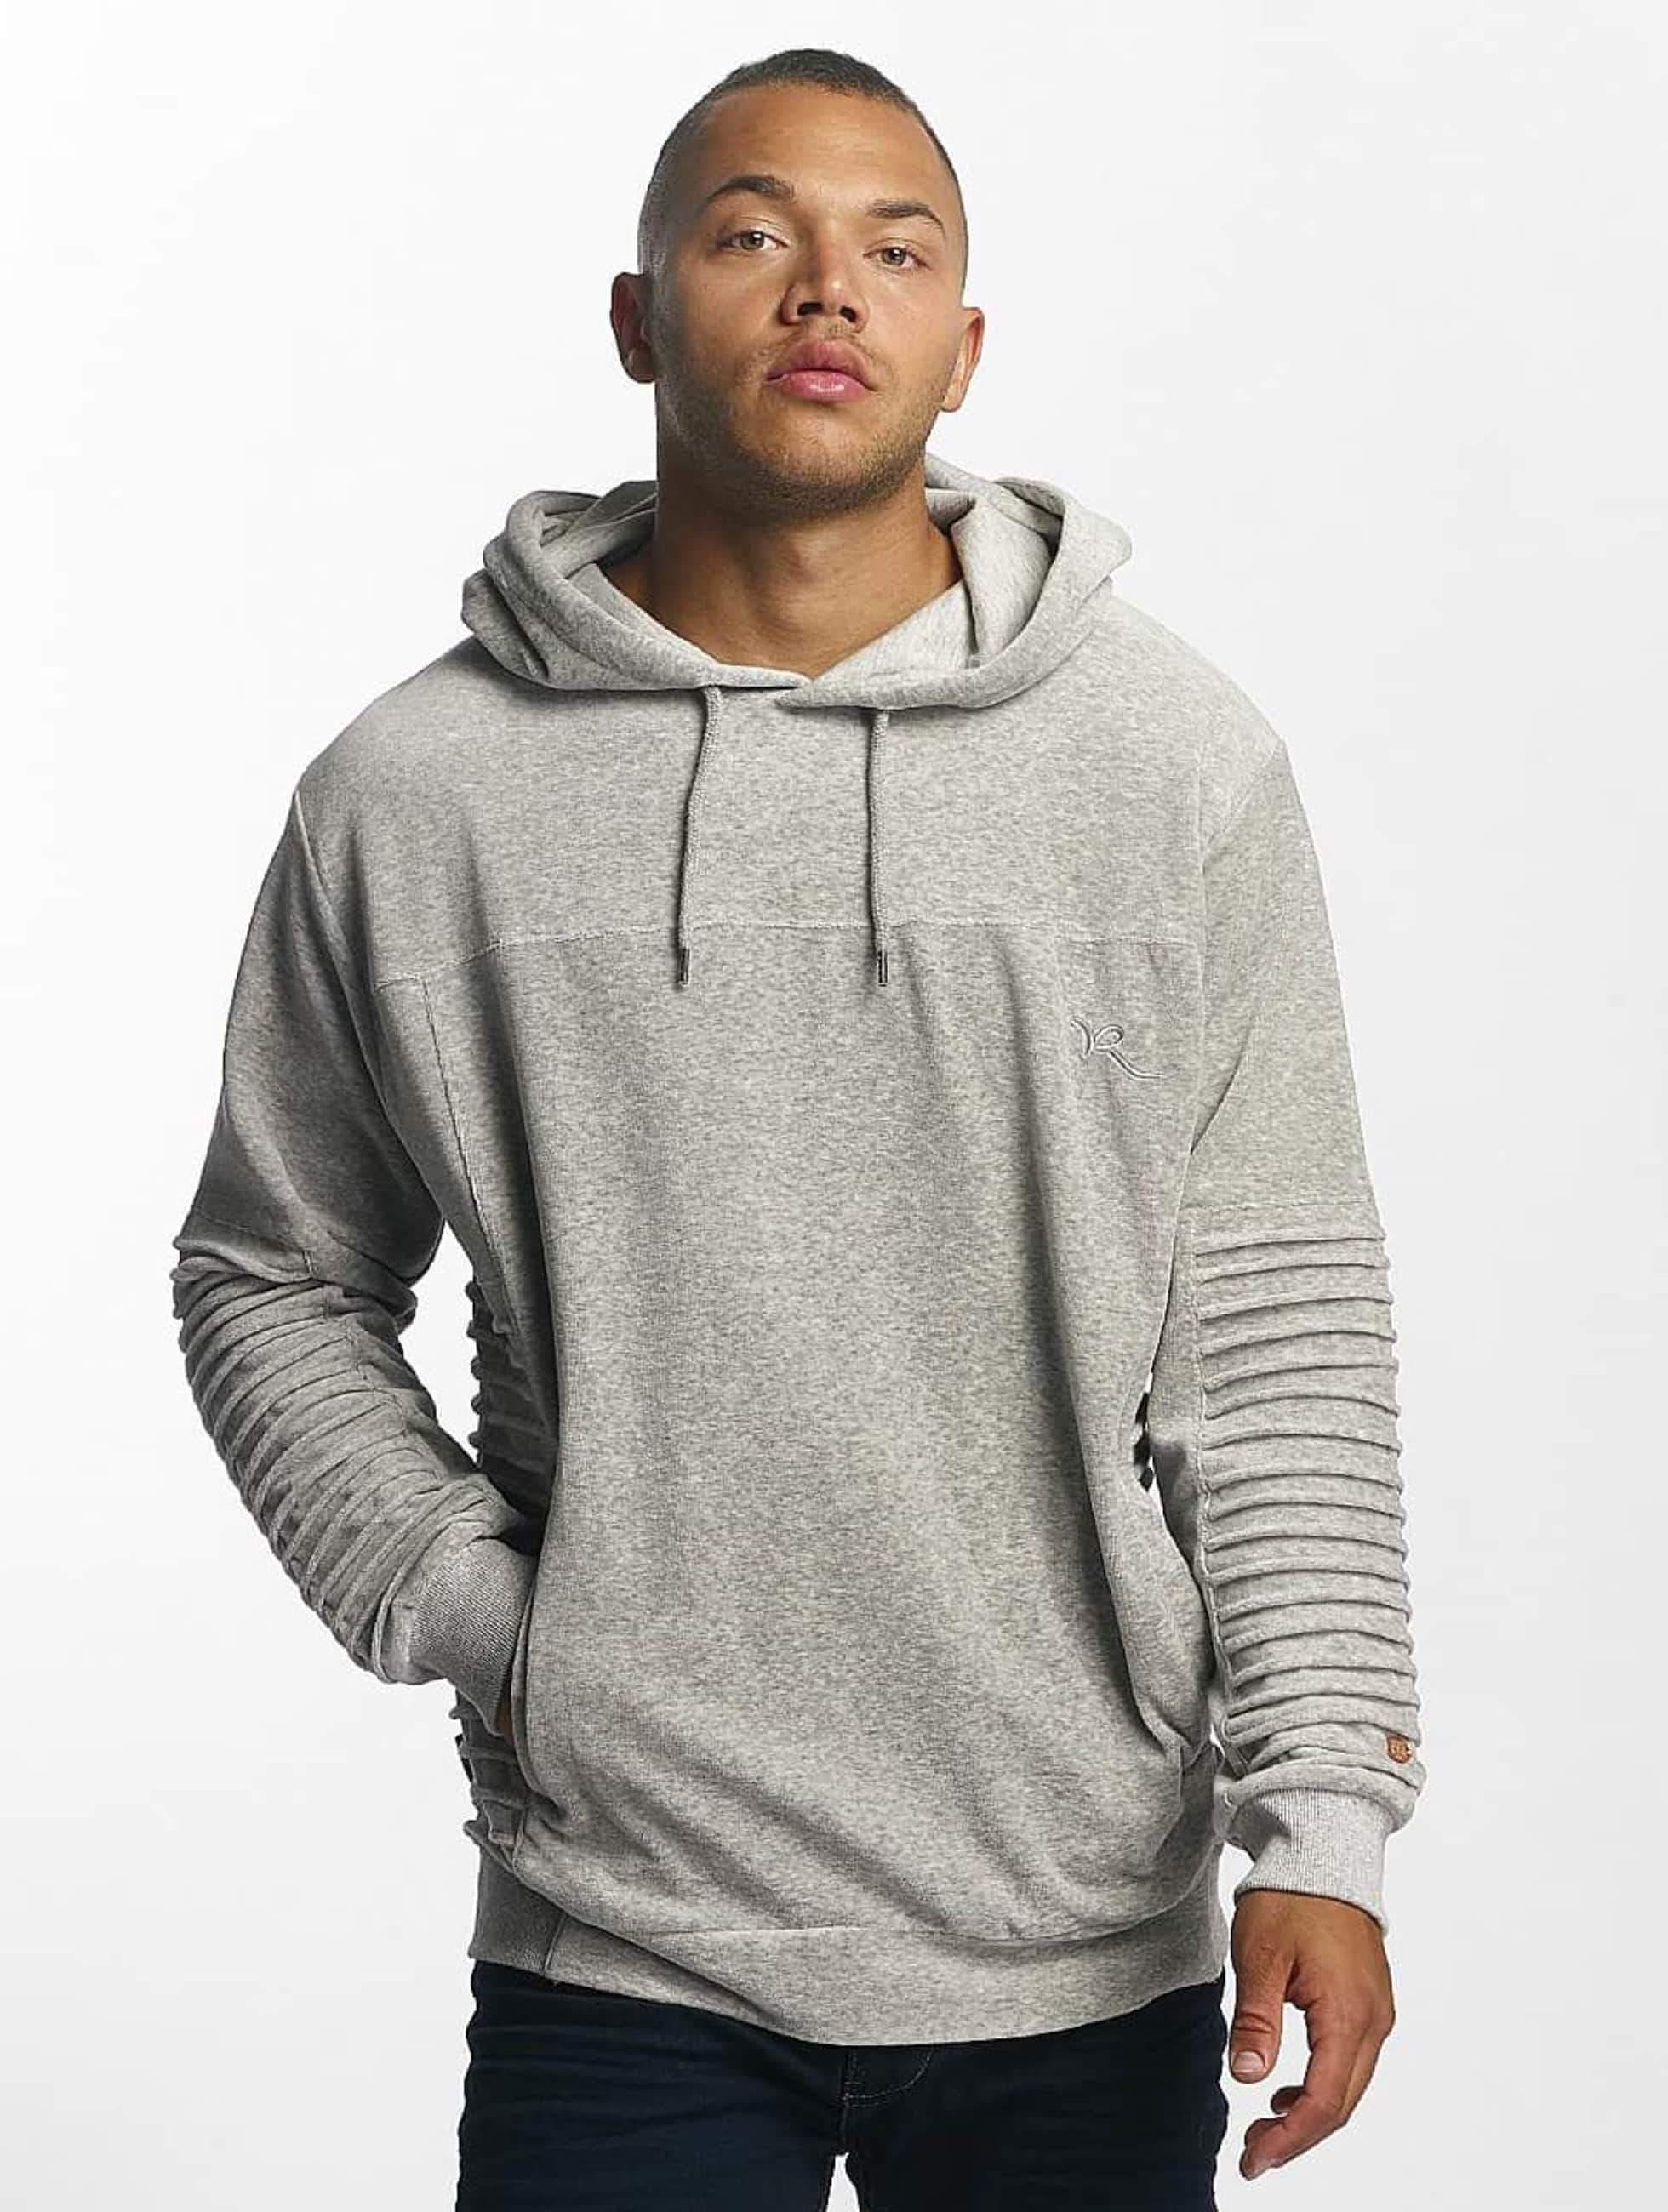 Rocawear / Hoodie Robin in grey S